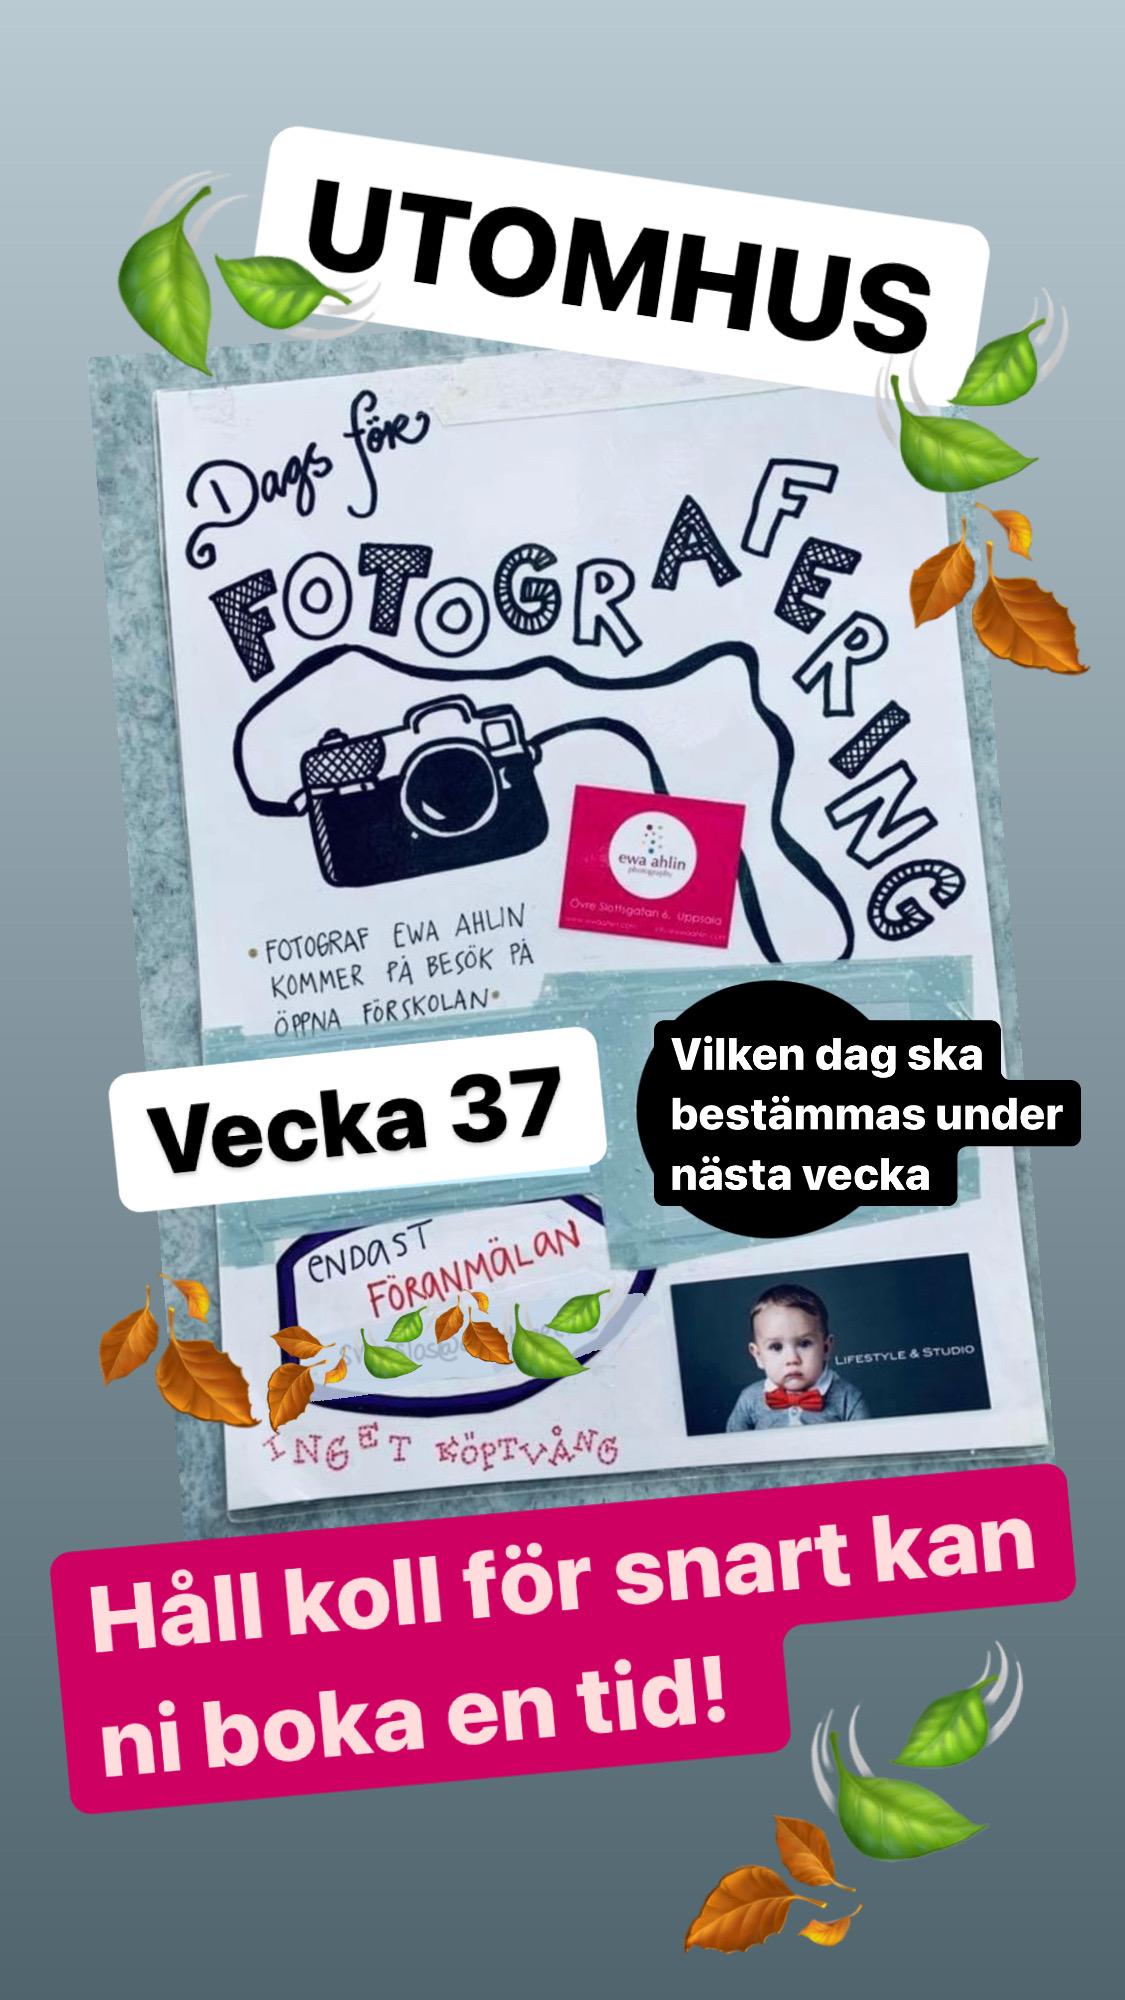 You are currently viewing Snart finns chans att boka fotograferingstid.